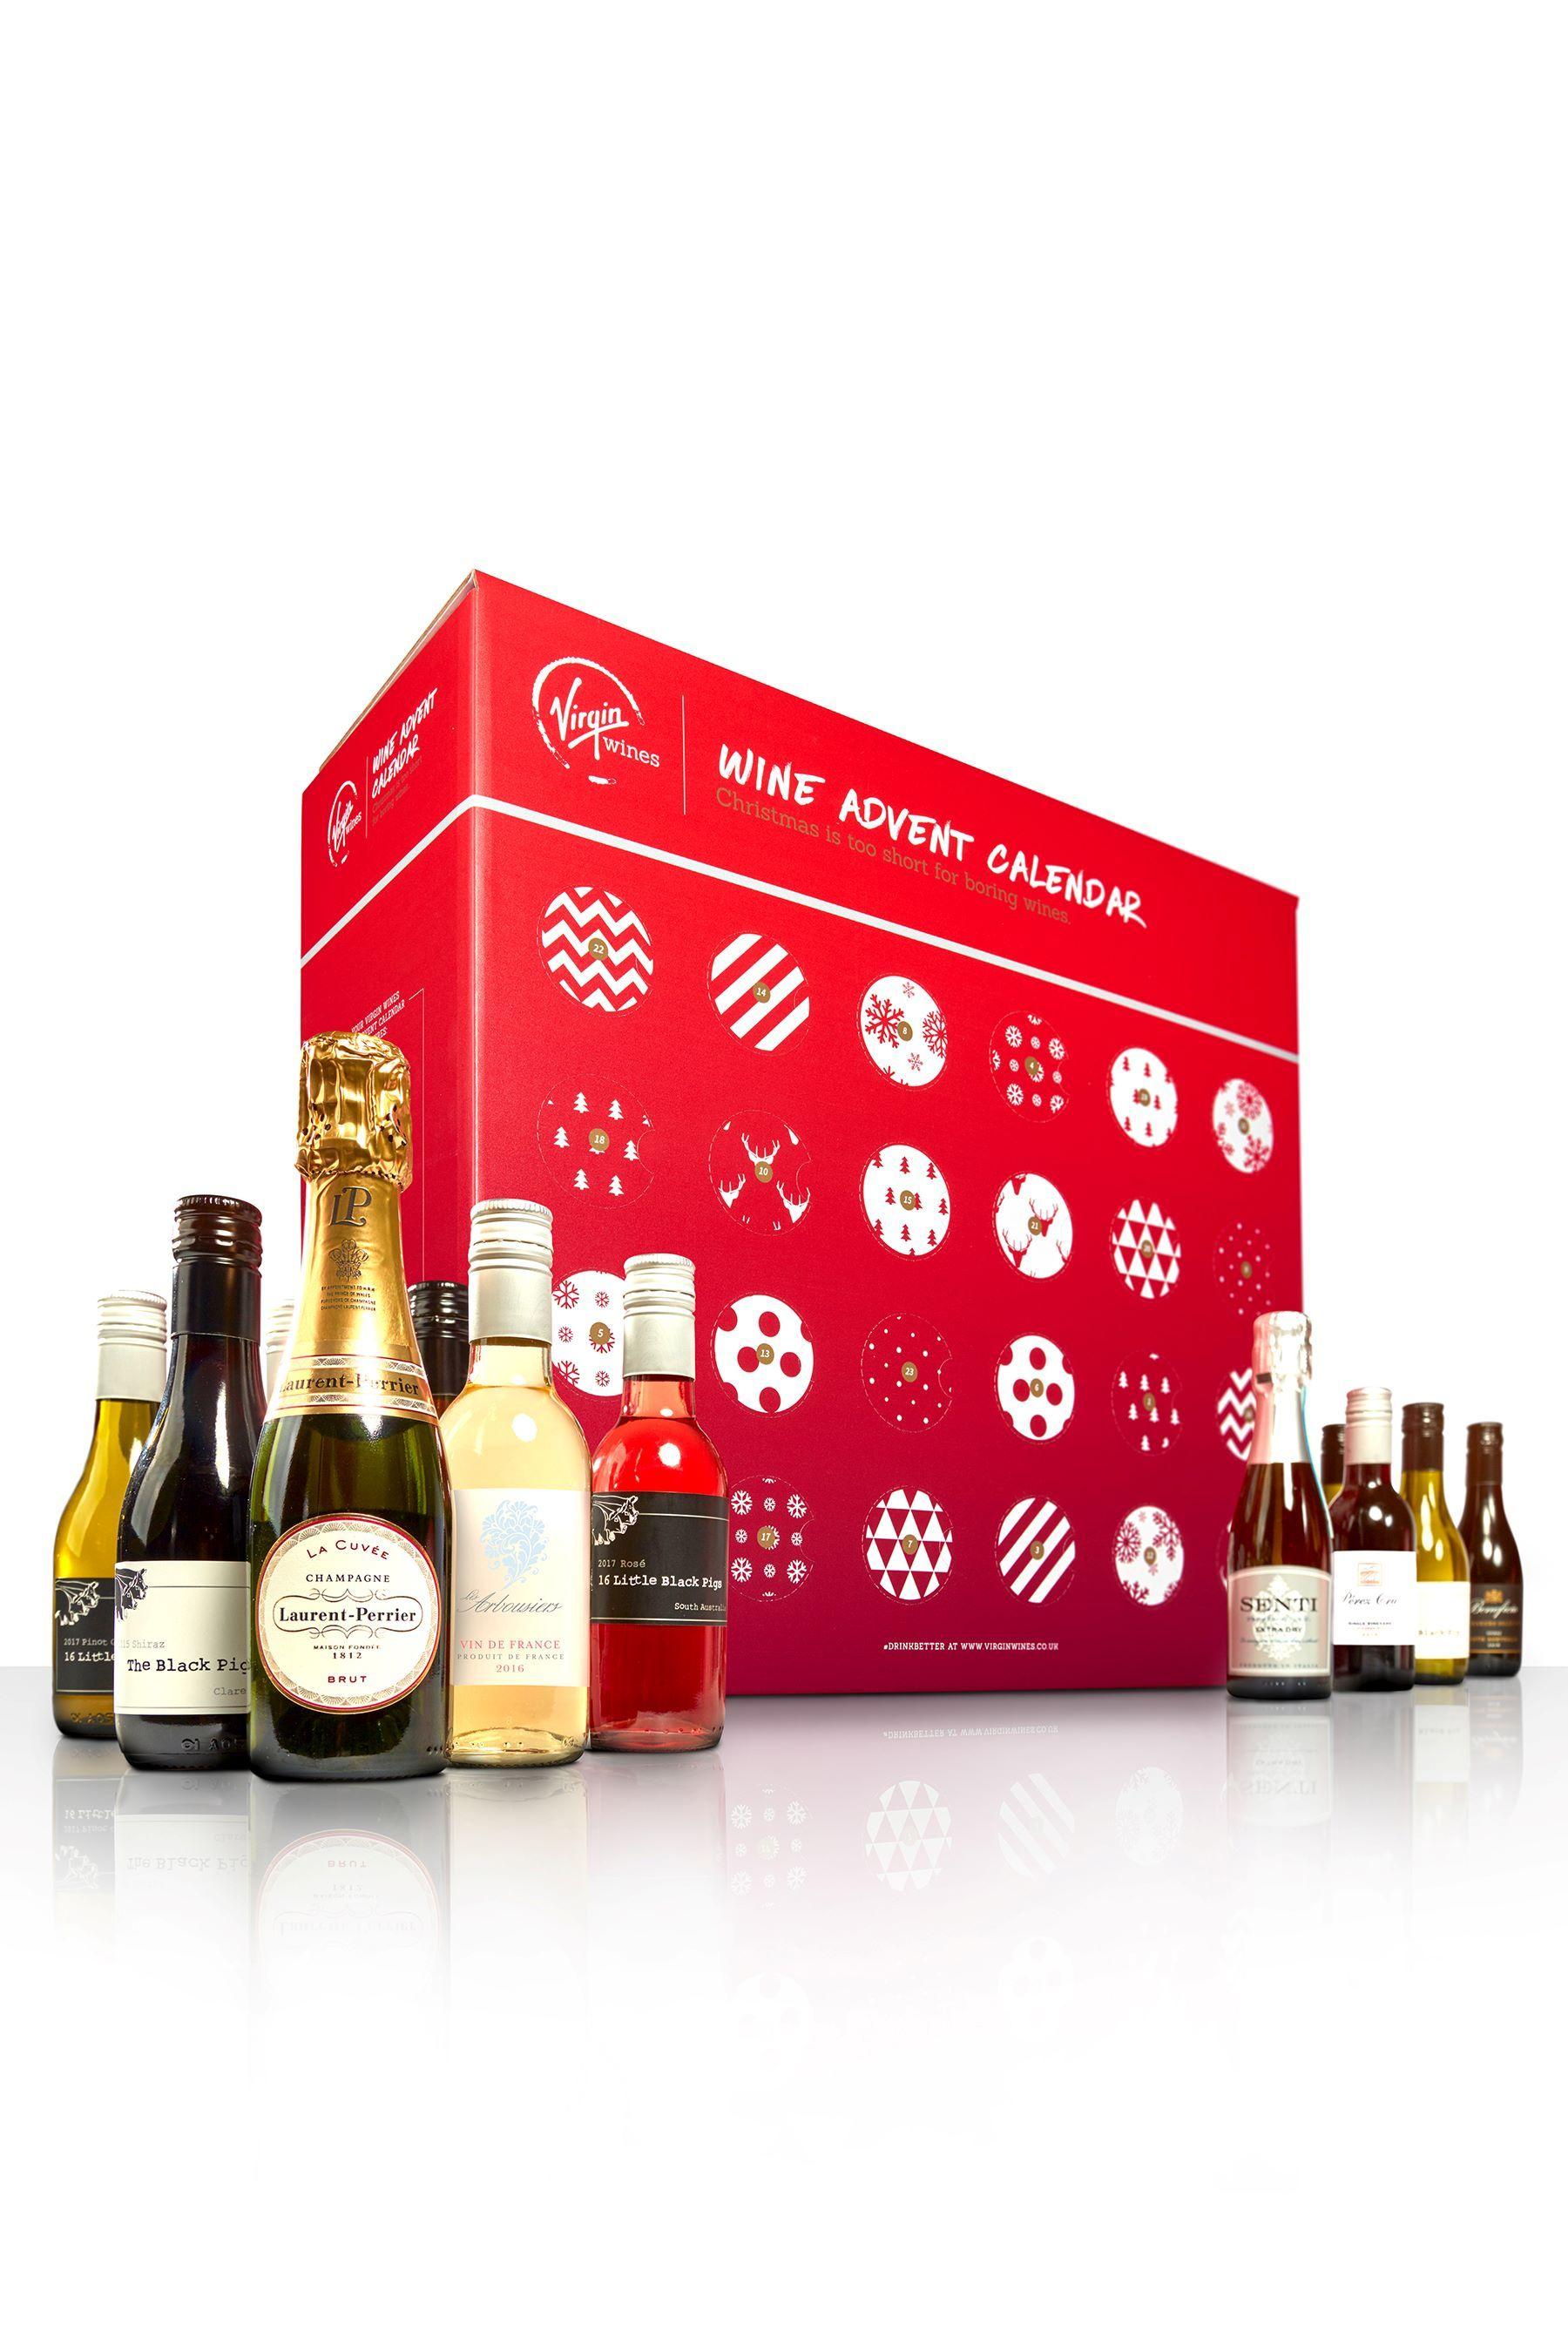 Virgin Wines Advent Calendar.Virgin Wines Mixed Wines Advent Calendar Products Wine Advent